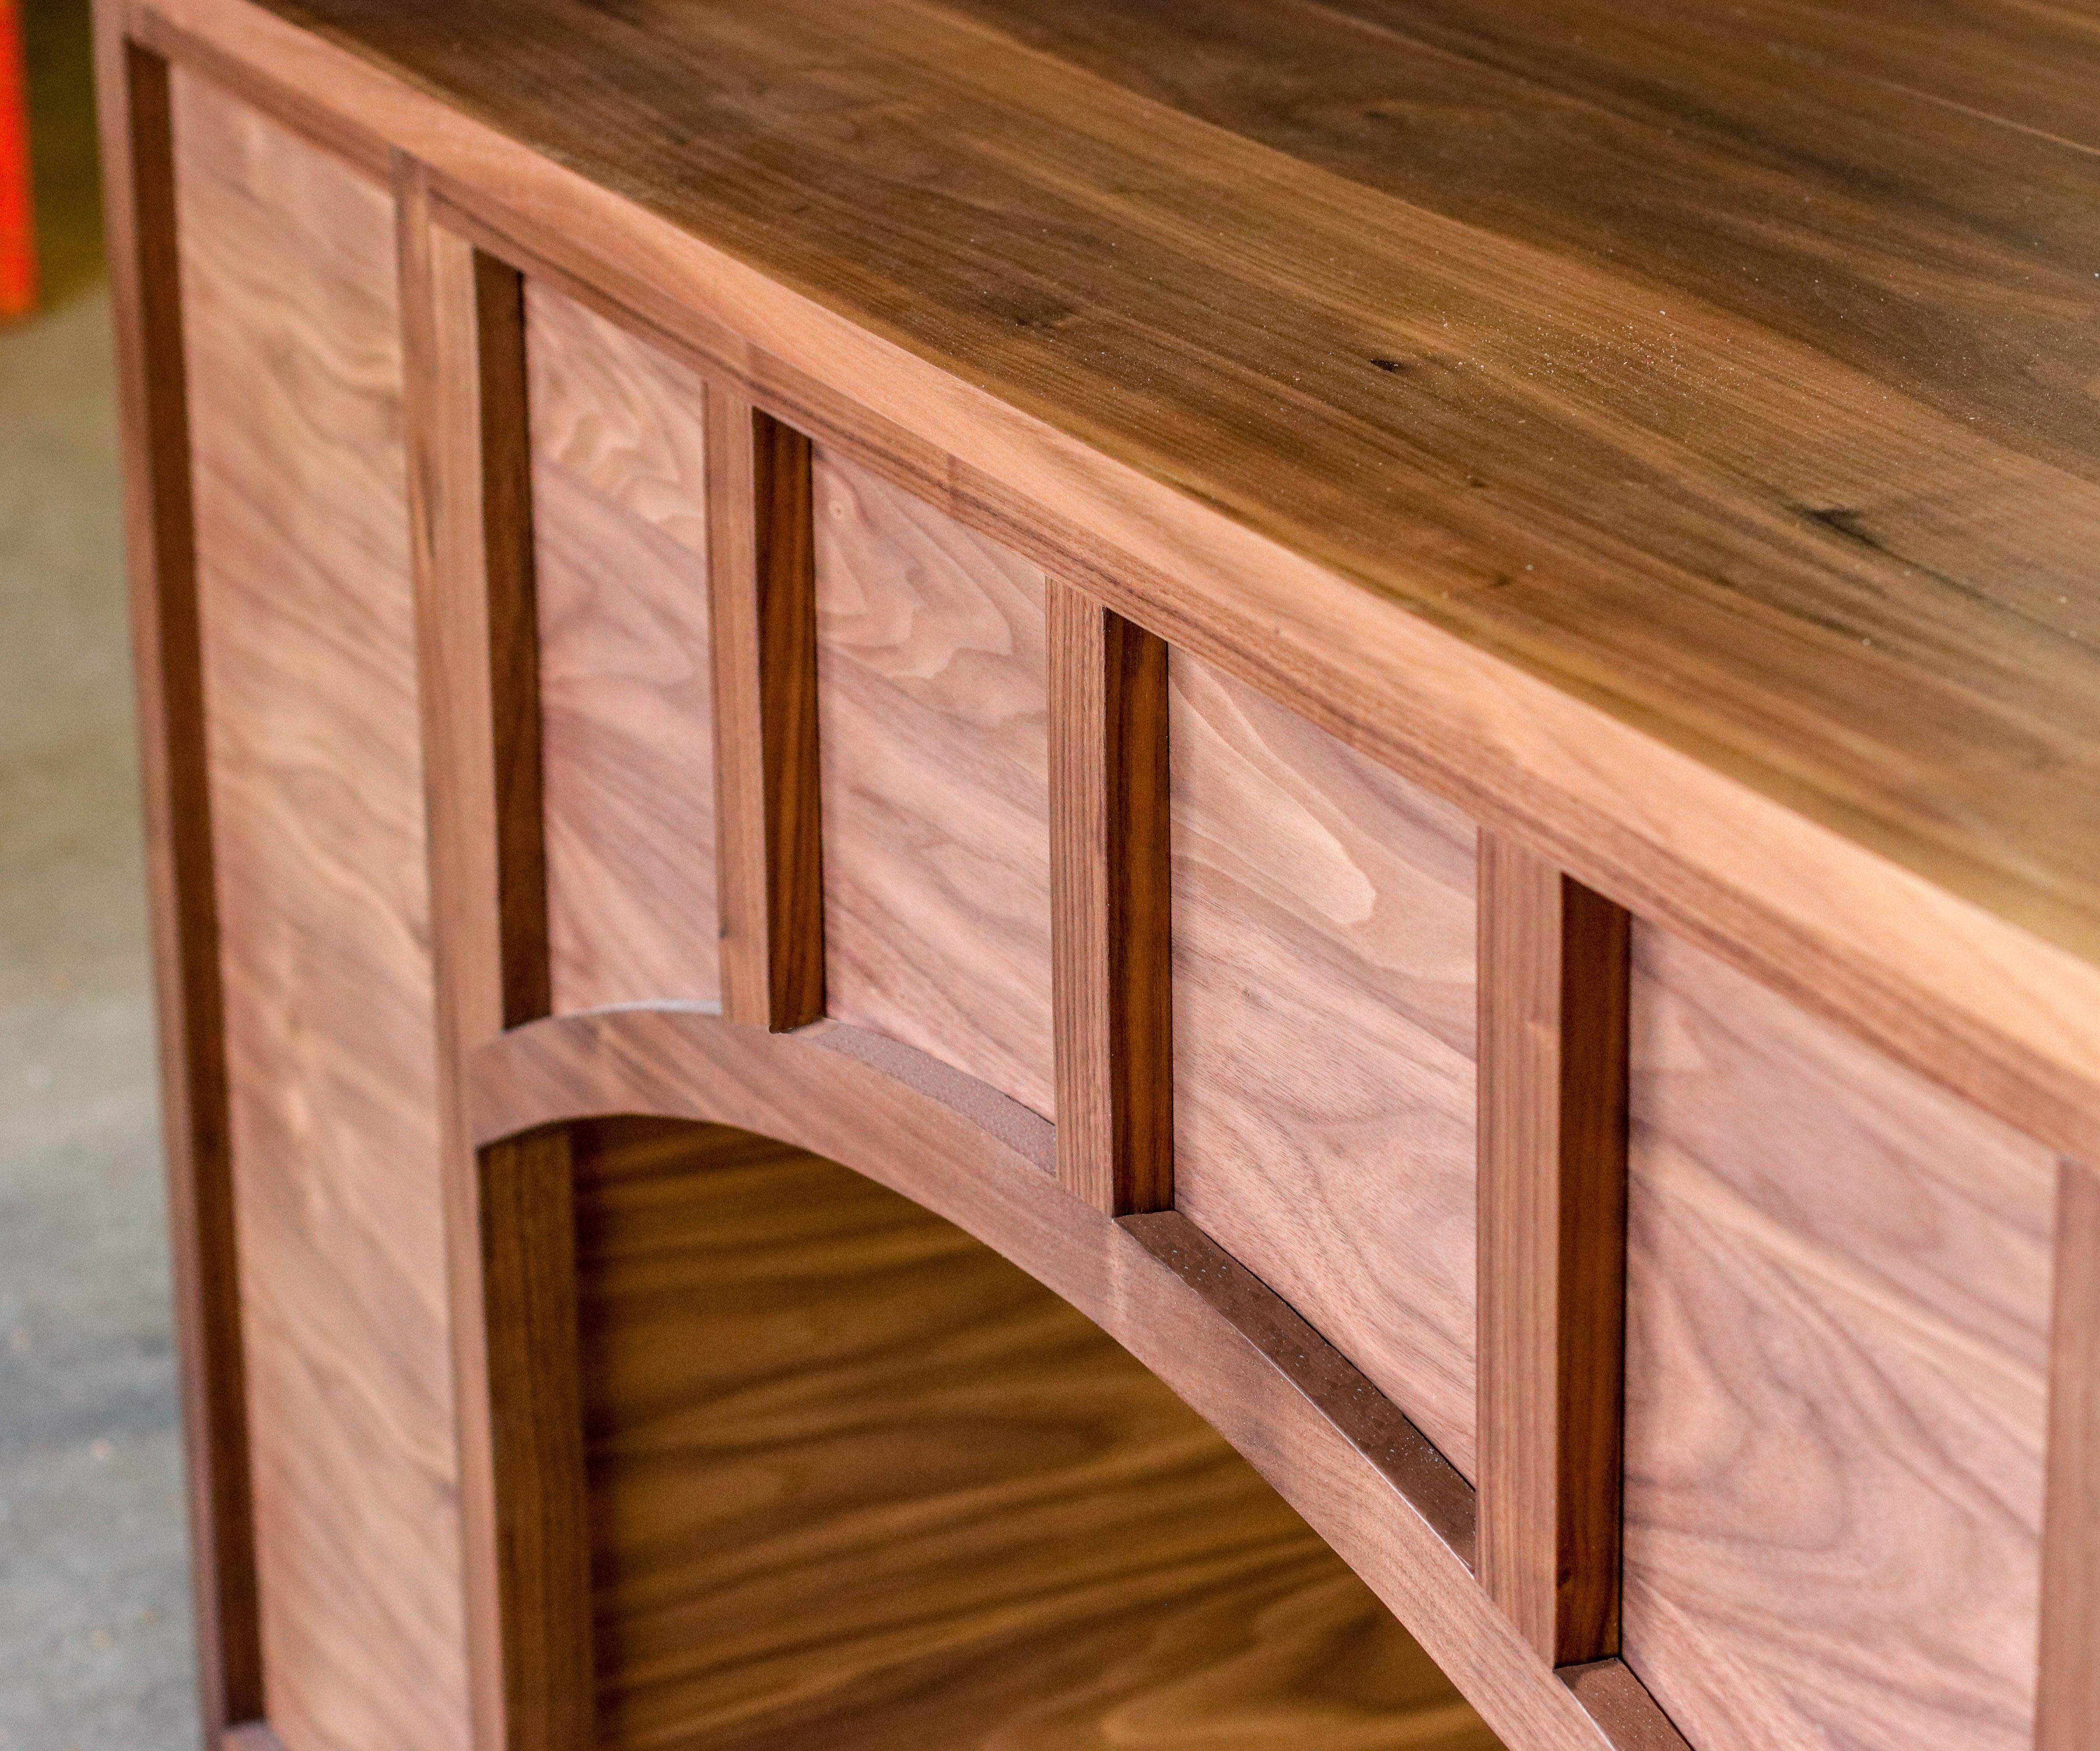 Building a Walnut Office Desk & Pricing It